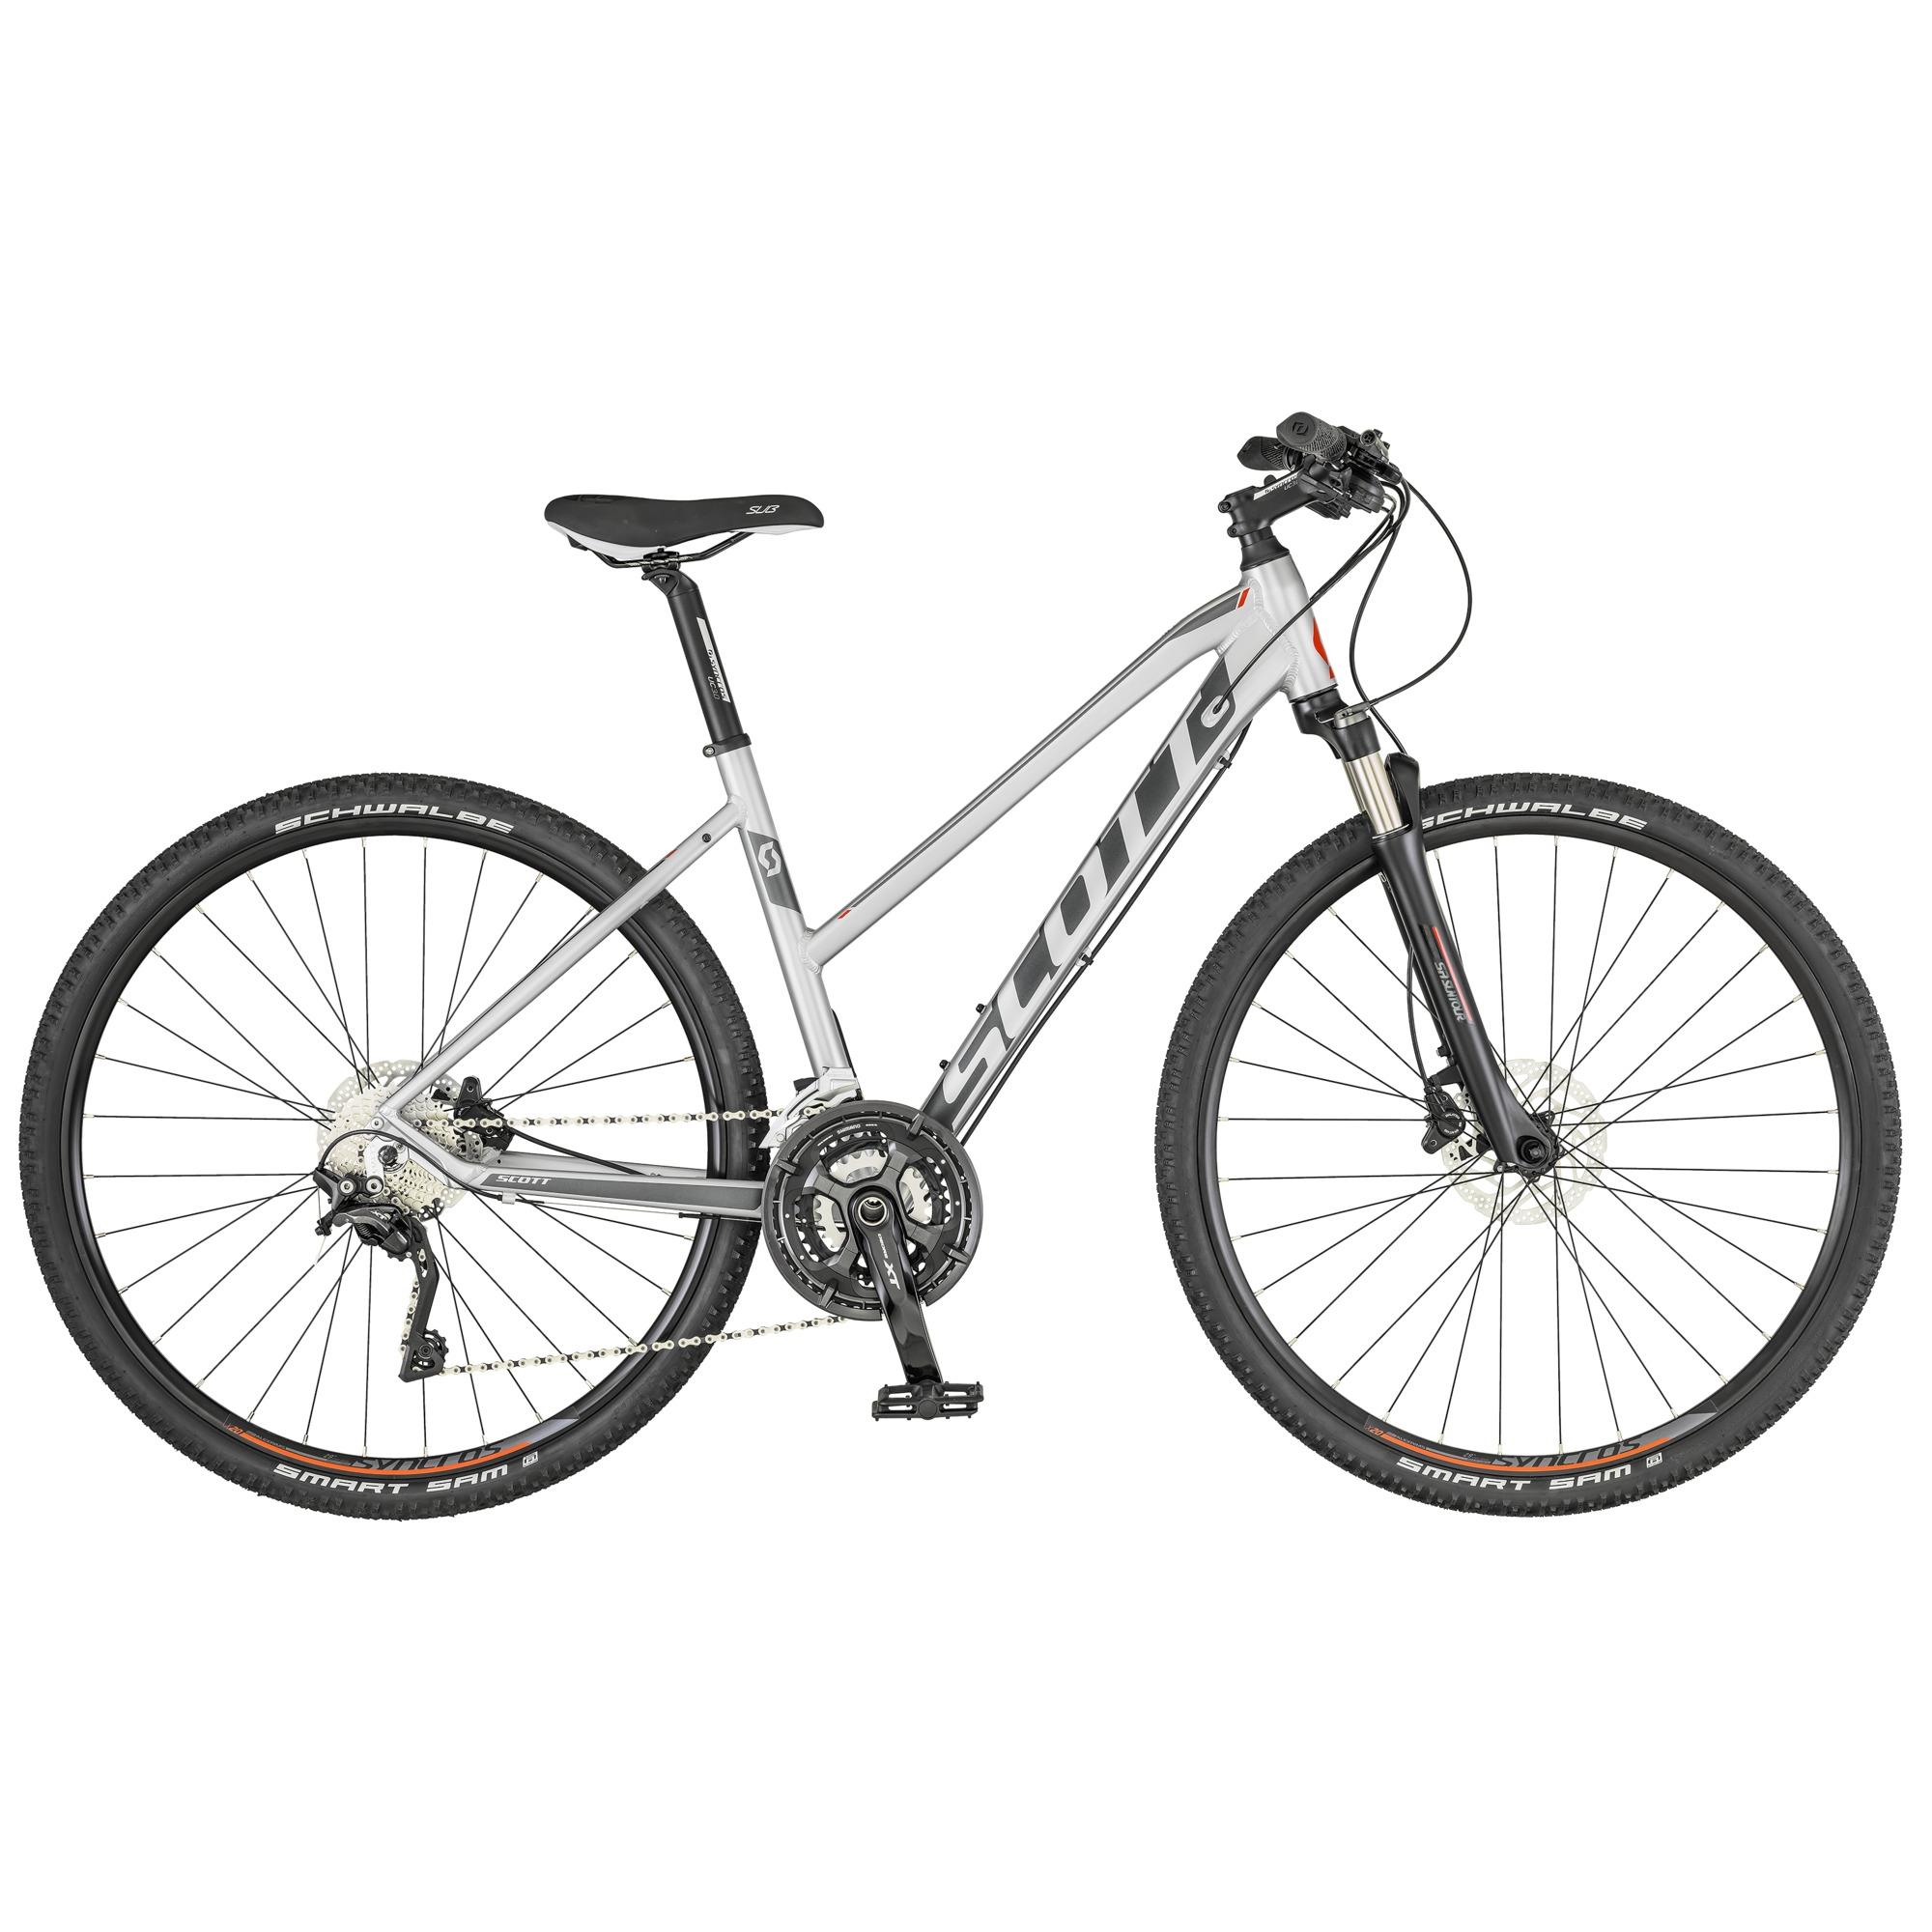 SCOTT Sub Cross 10 Lady Fahrrad M - Fahrrad online kaufen | Online Shop Bike Profis